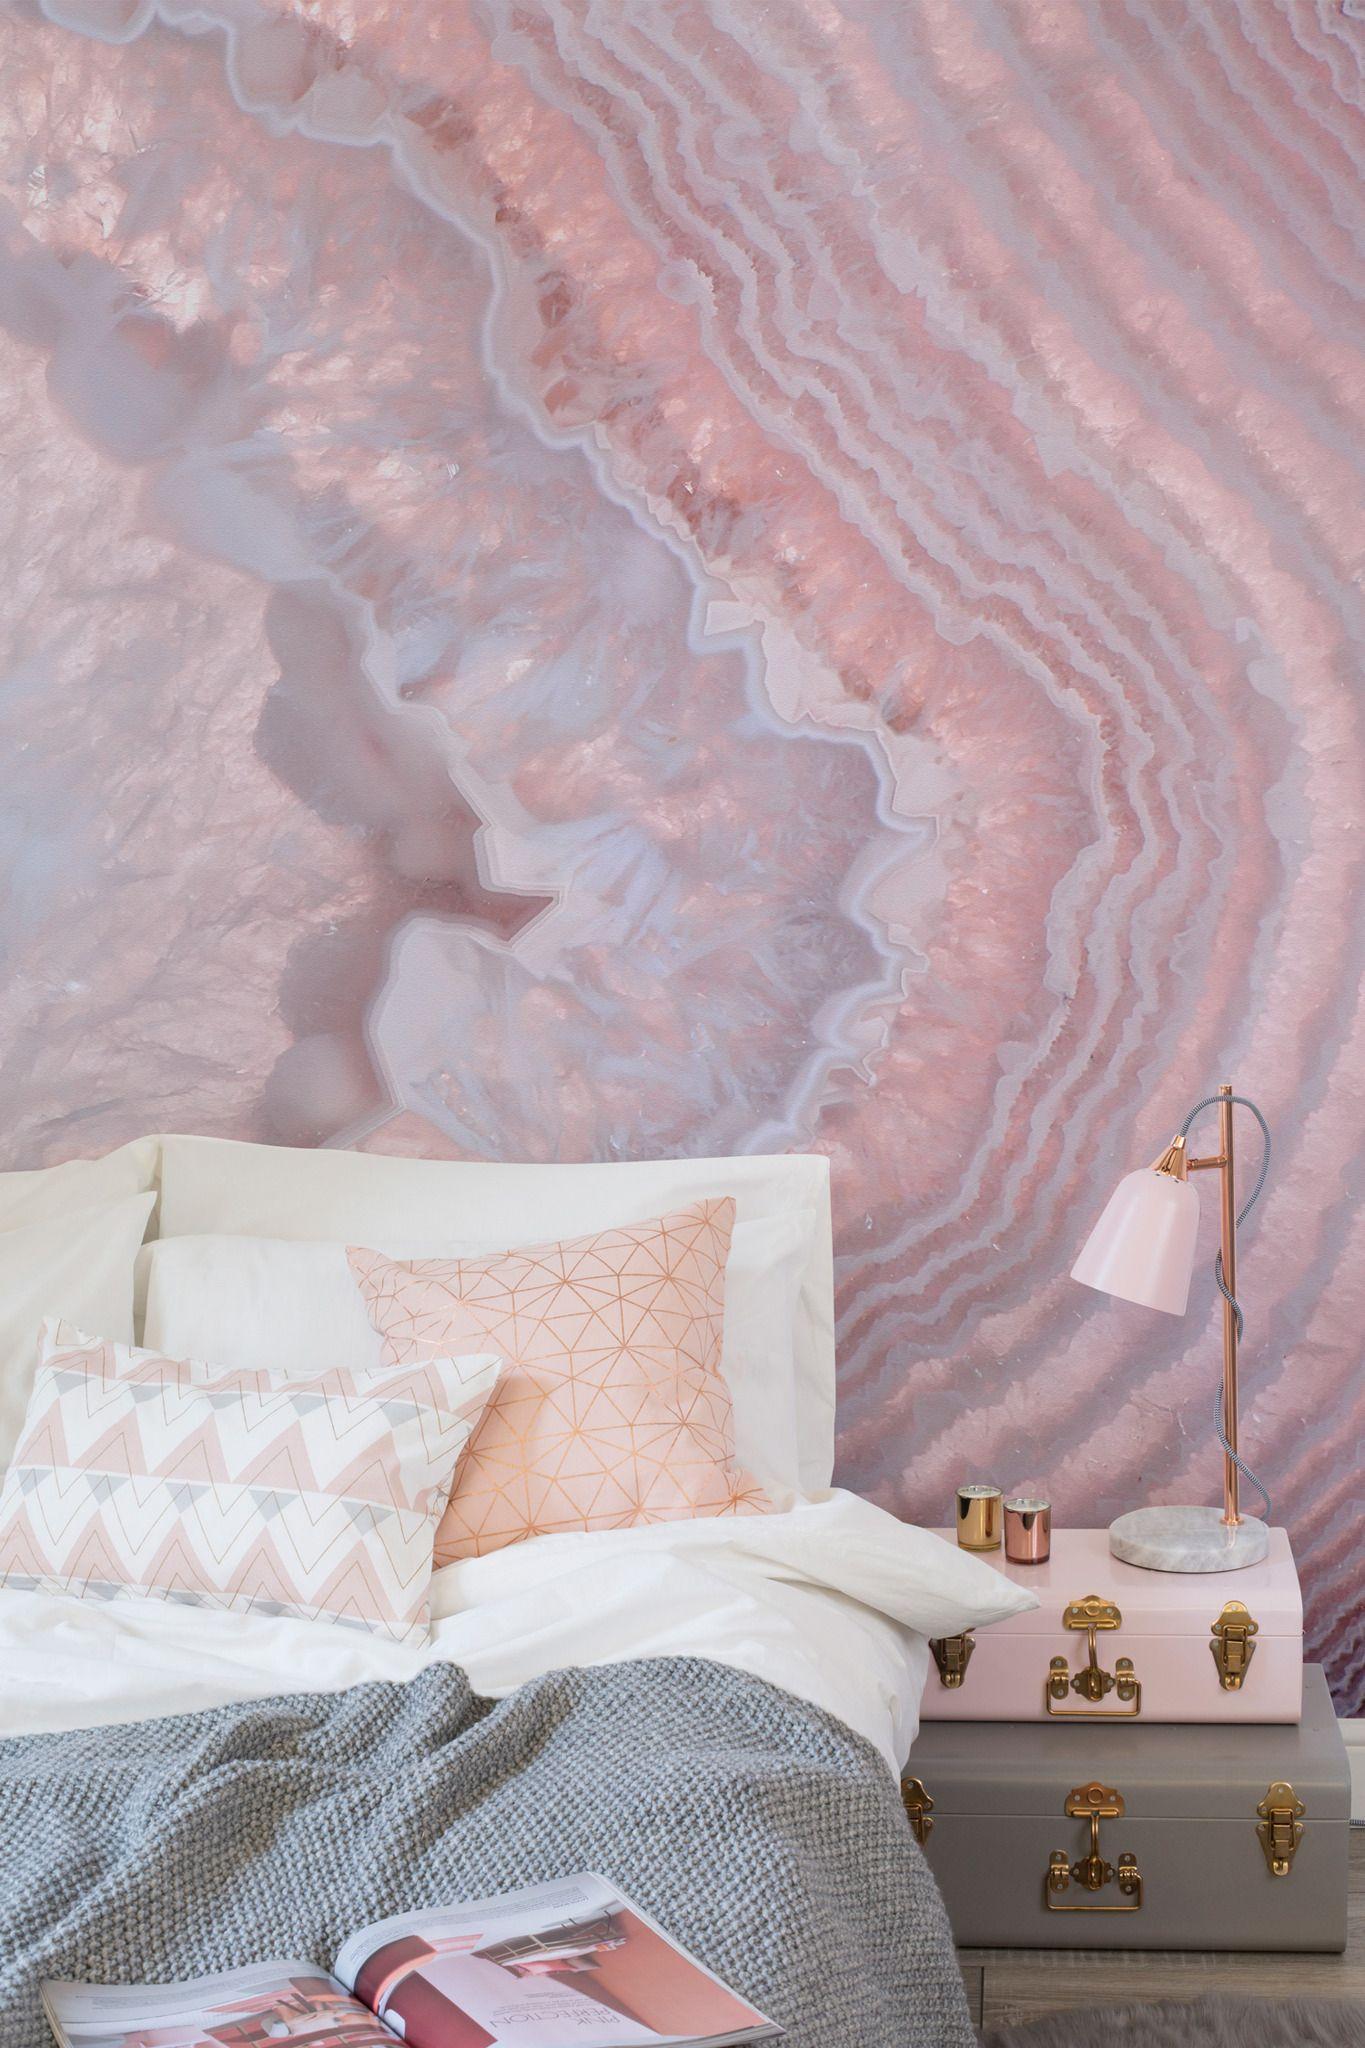 Crystal wall murals room decor bedroom decor decor